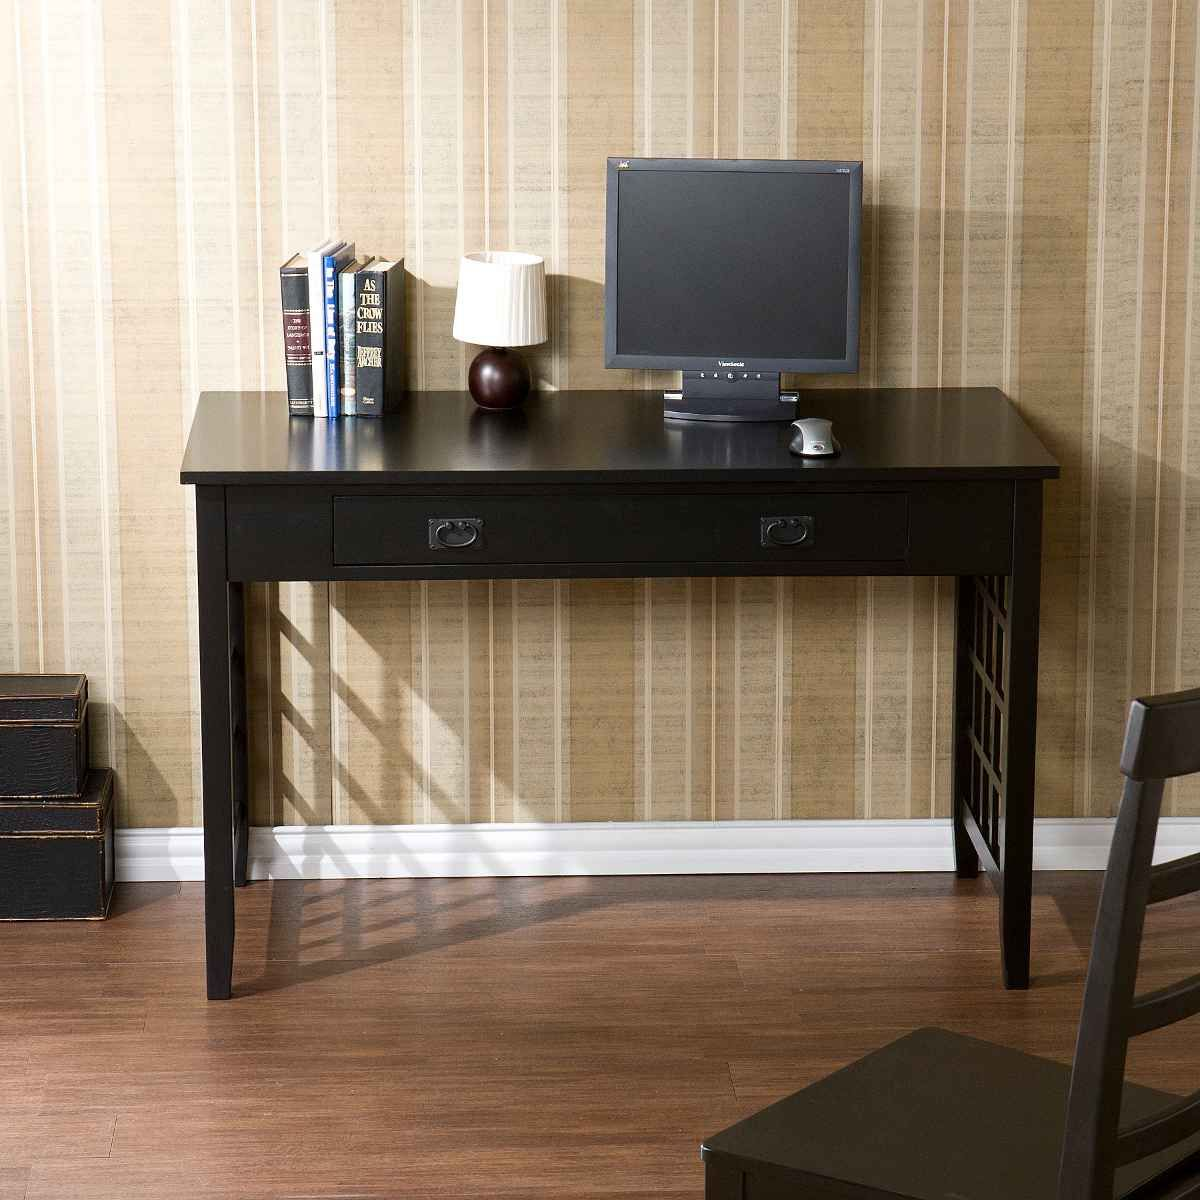 Laticce Computer Desk with Drawer from SEI   Dark wood desk, Black